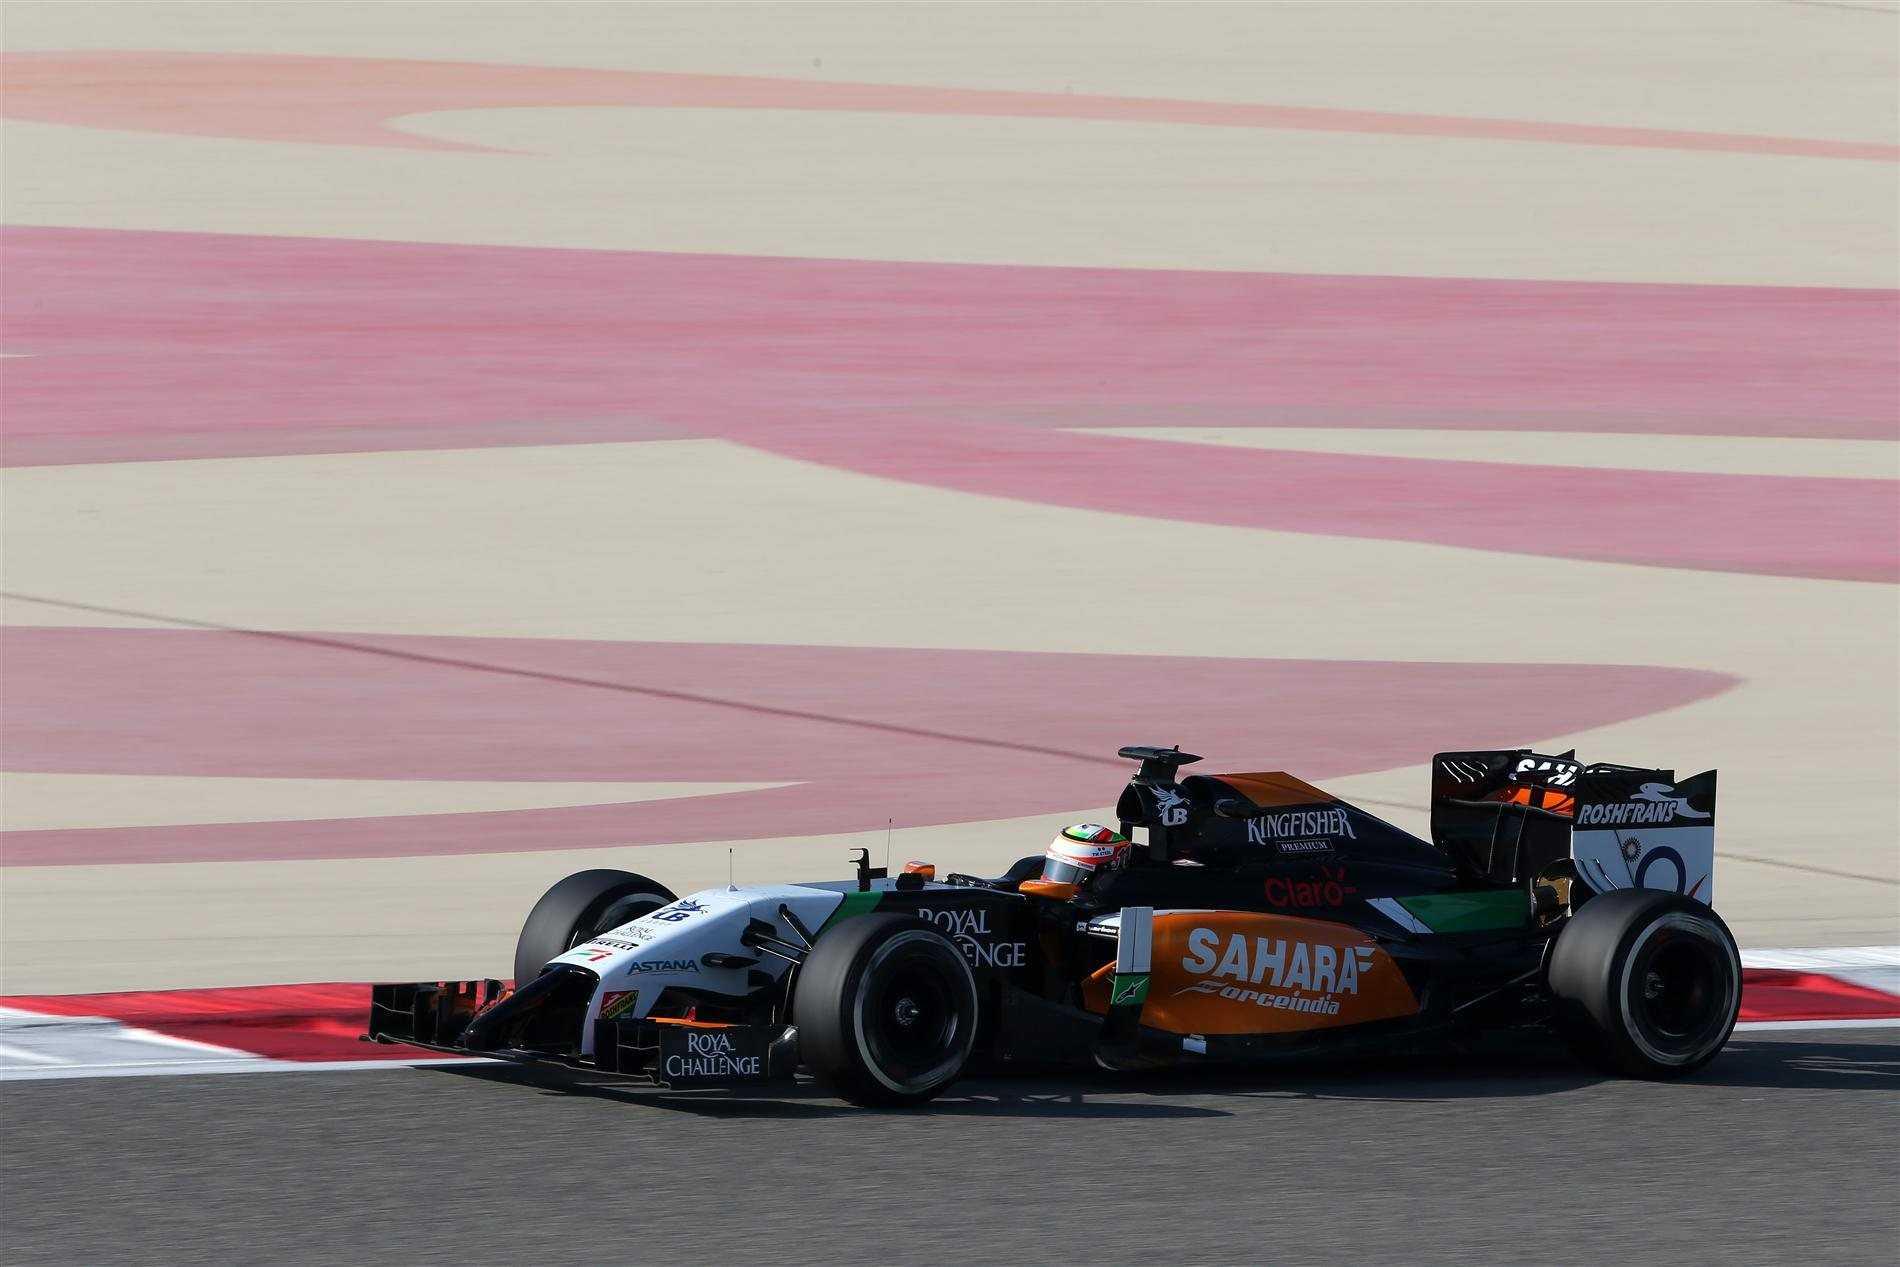 Sergio Perez - 11